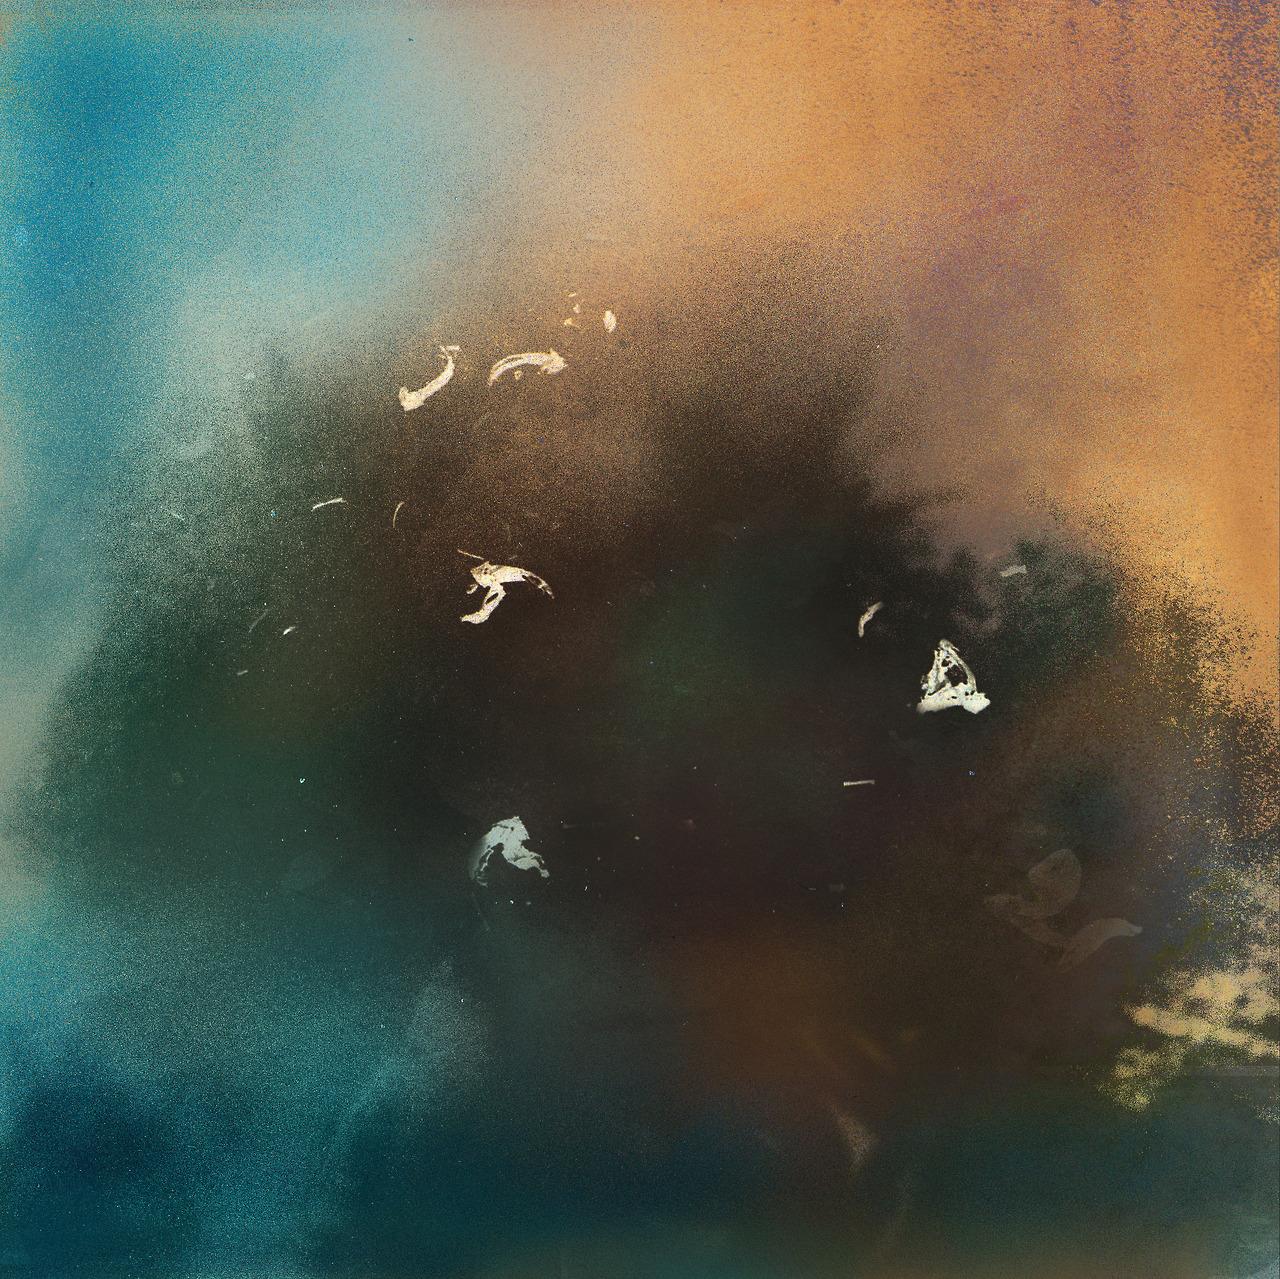 Stream Suno Deko <em>Thrown Color</em> EP (Stereogum Premiere)